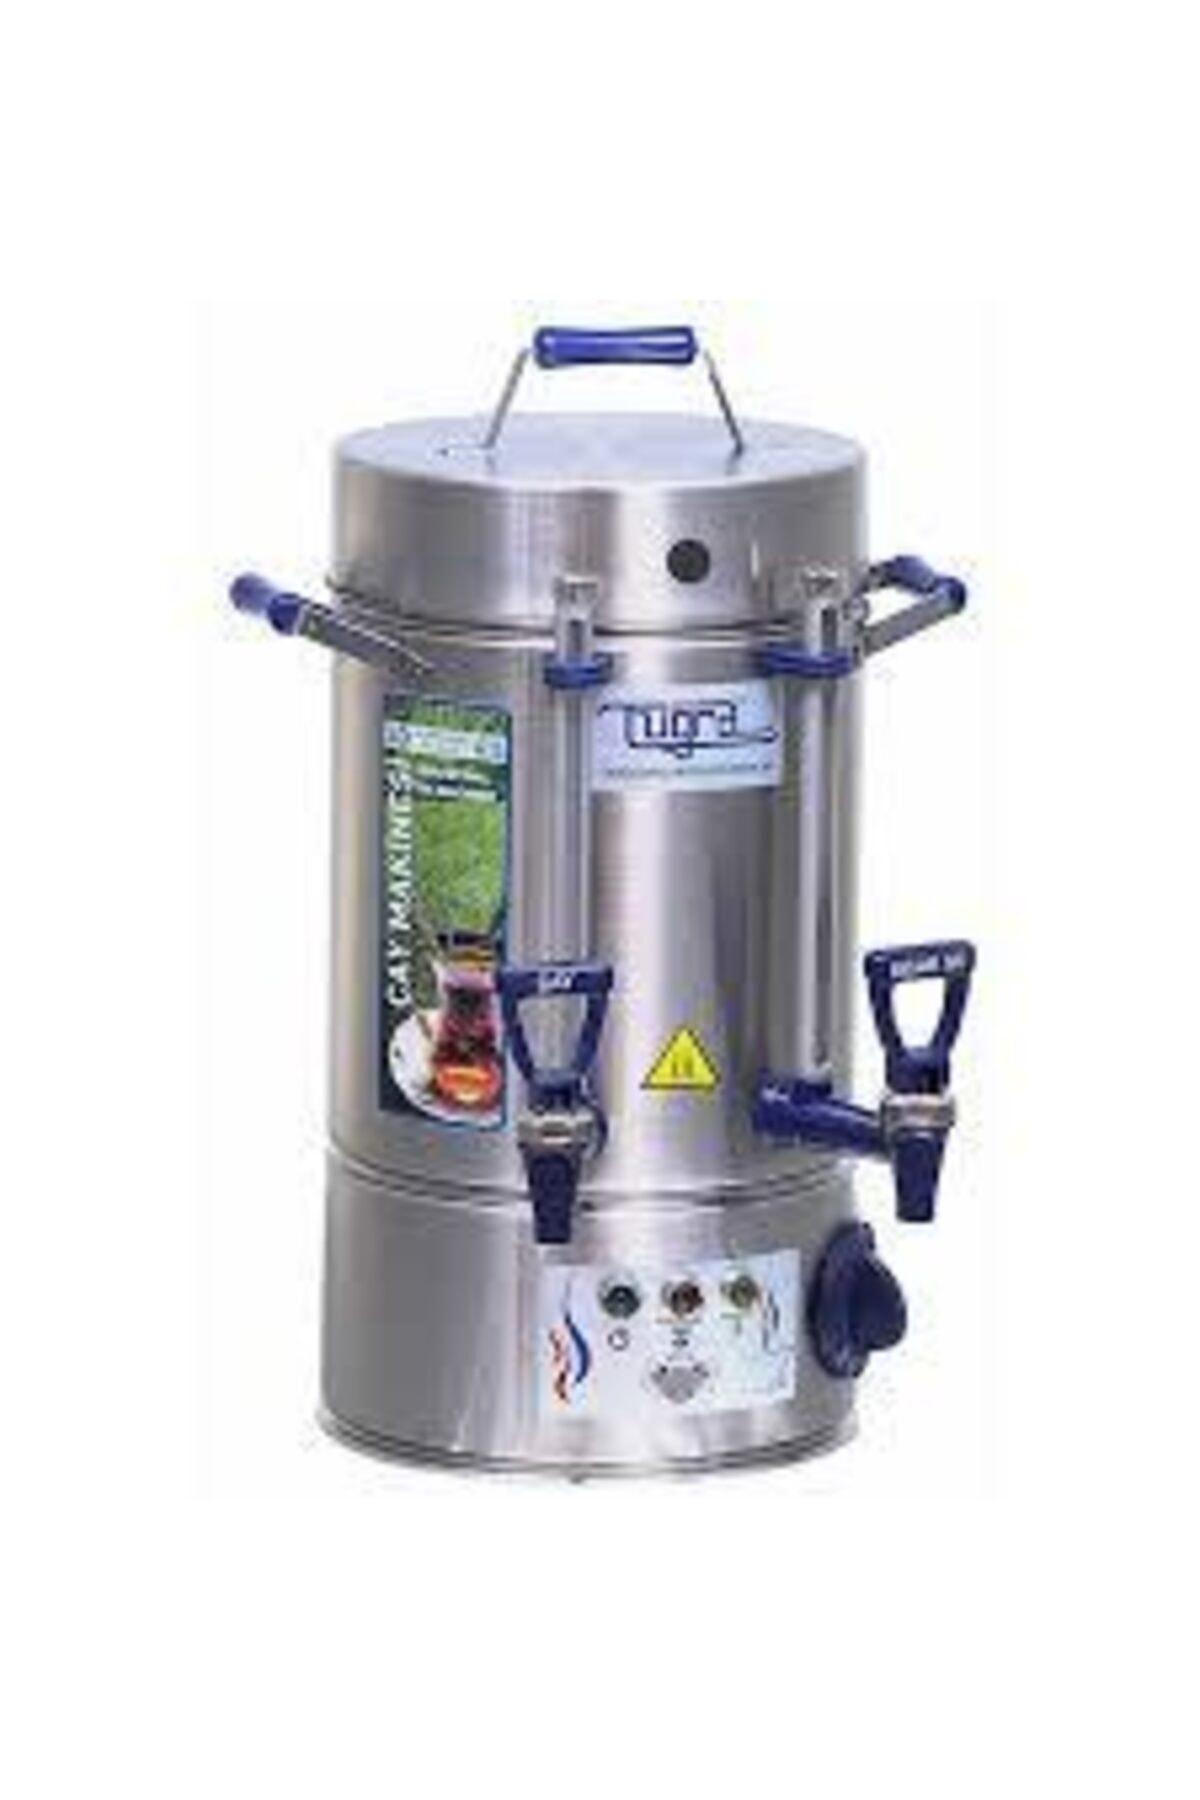 Tuğra Xx-260 T1030 1030 30 أكواب 4 Lt الشاي صانع الشاي الآلي-التلقائي بالكامل نظام السلامة T 1030